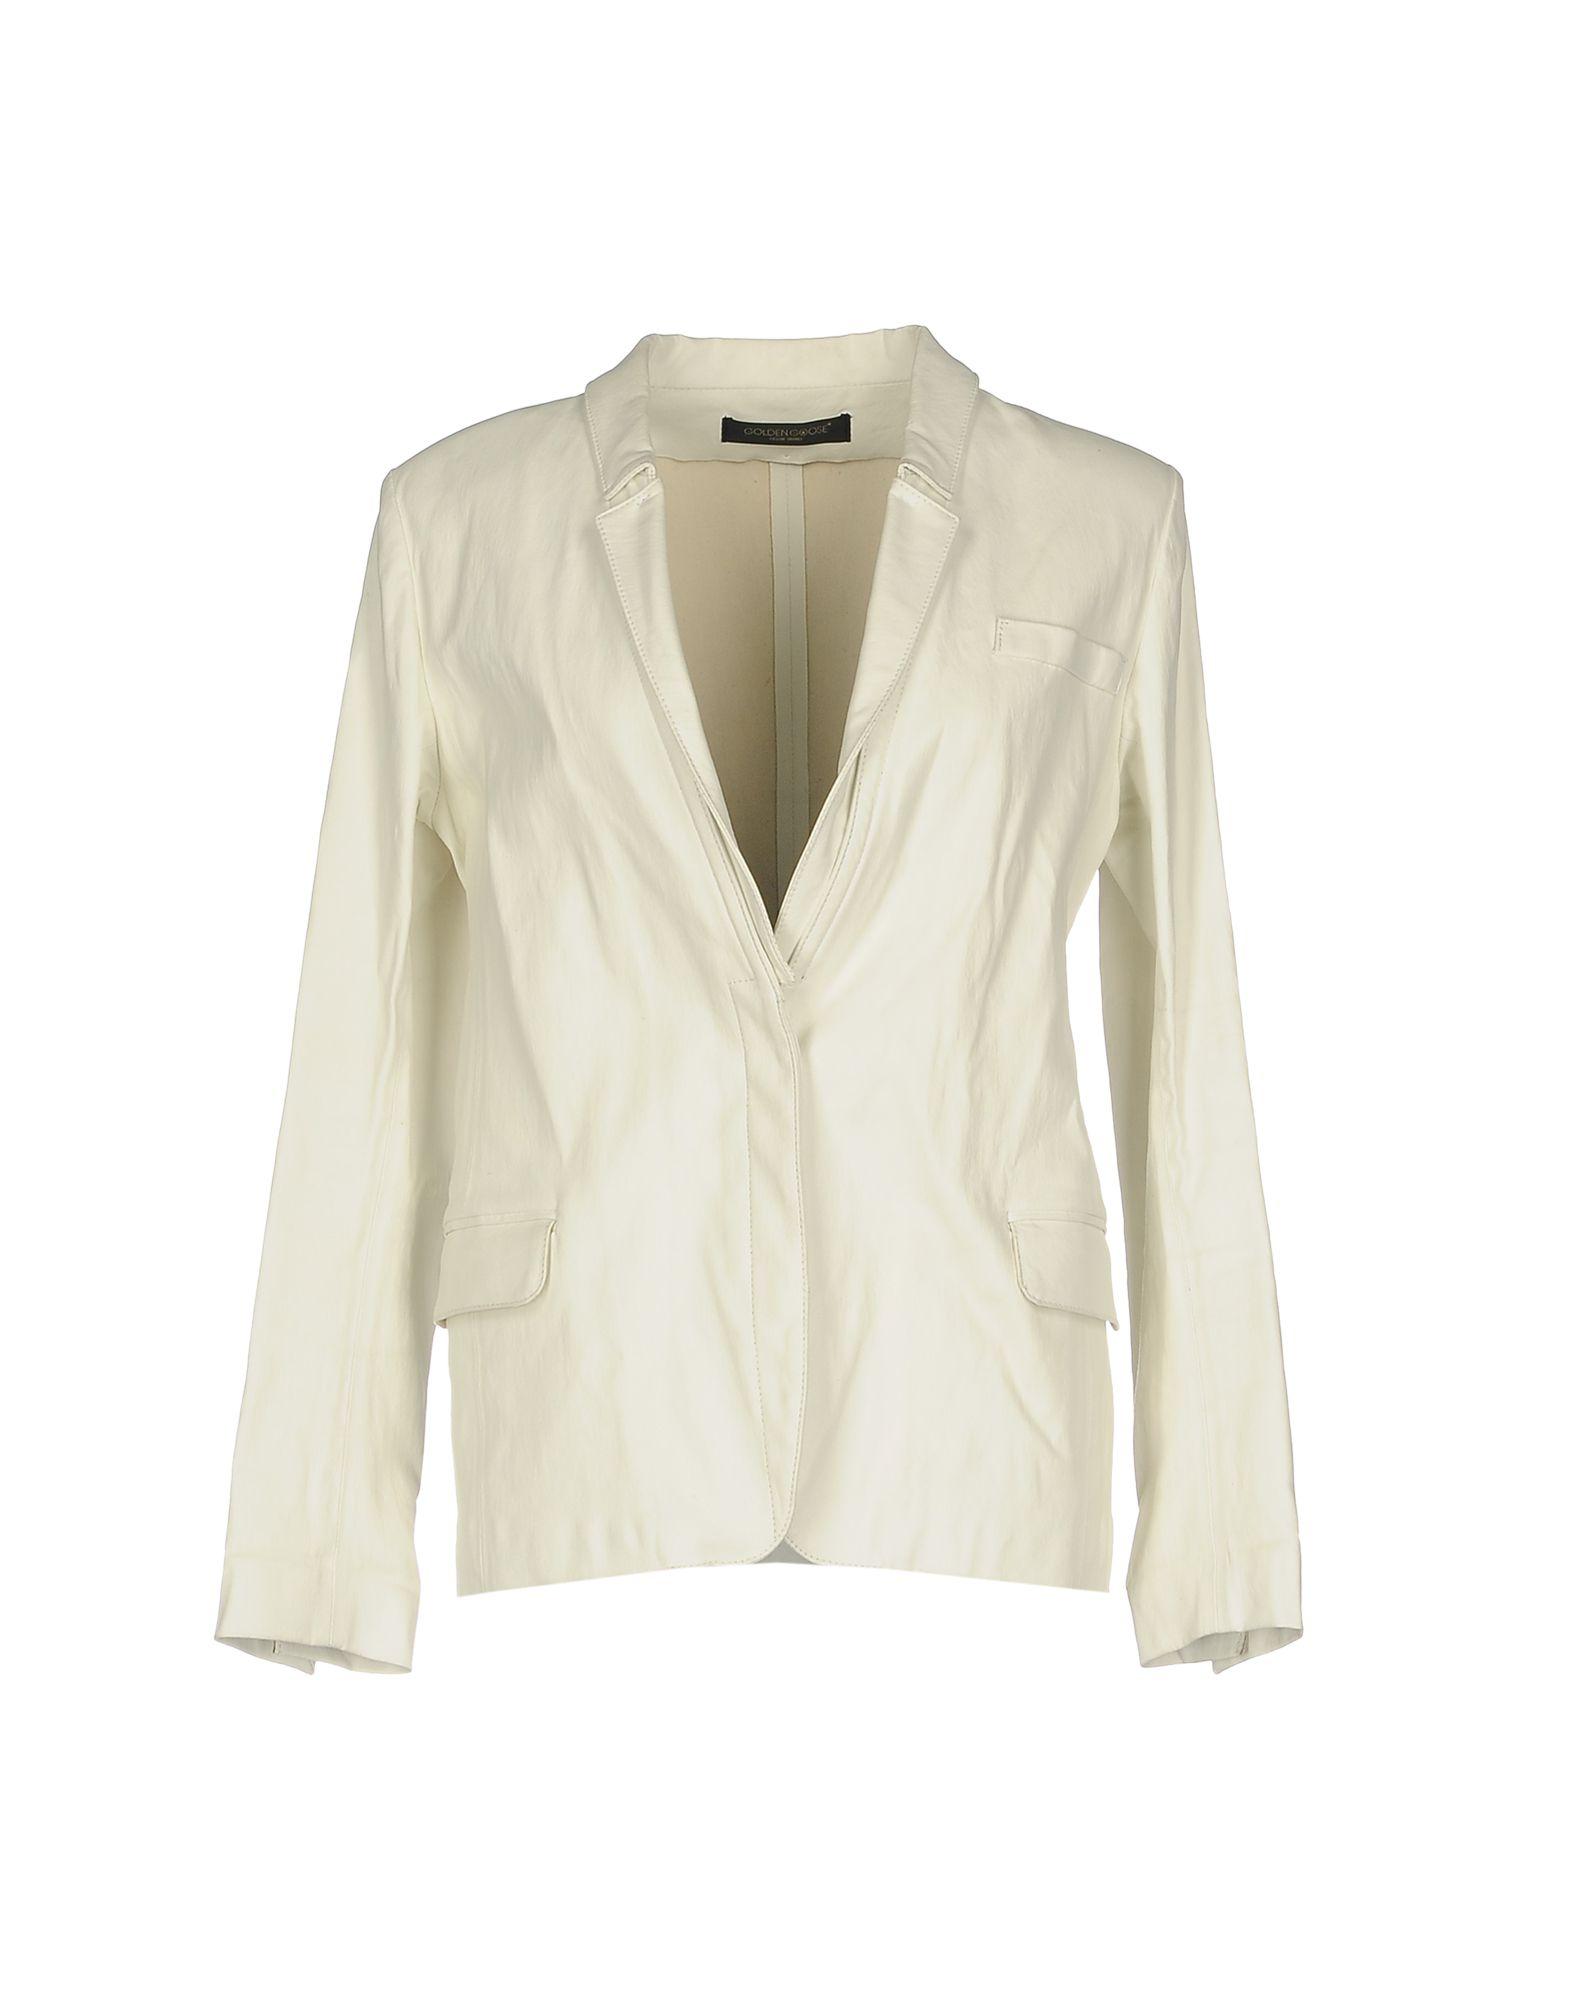 Giacca Golden Goose Deluxe Brand Donna - Acquista online su YFrjTfSbO9